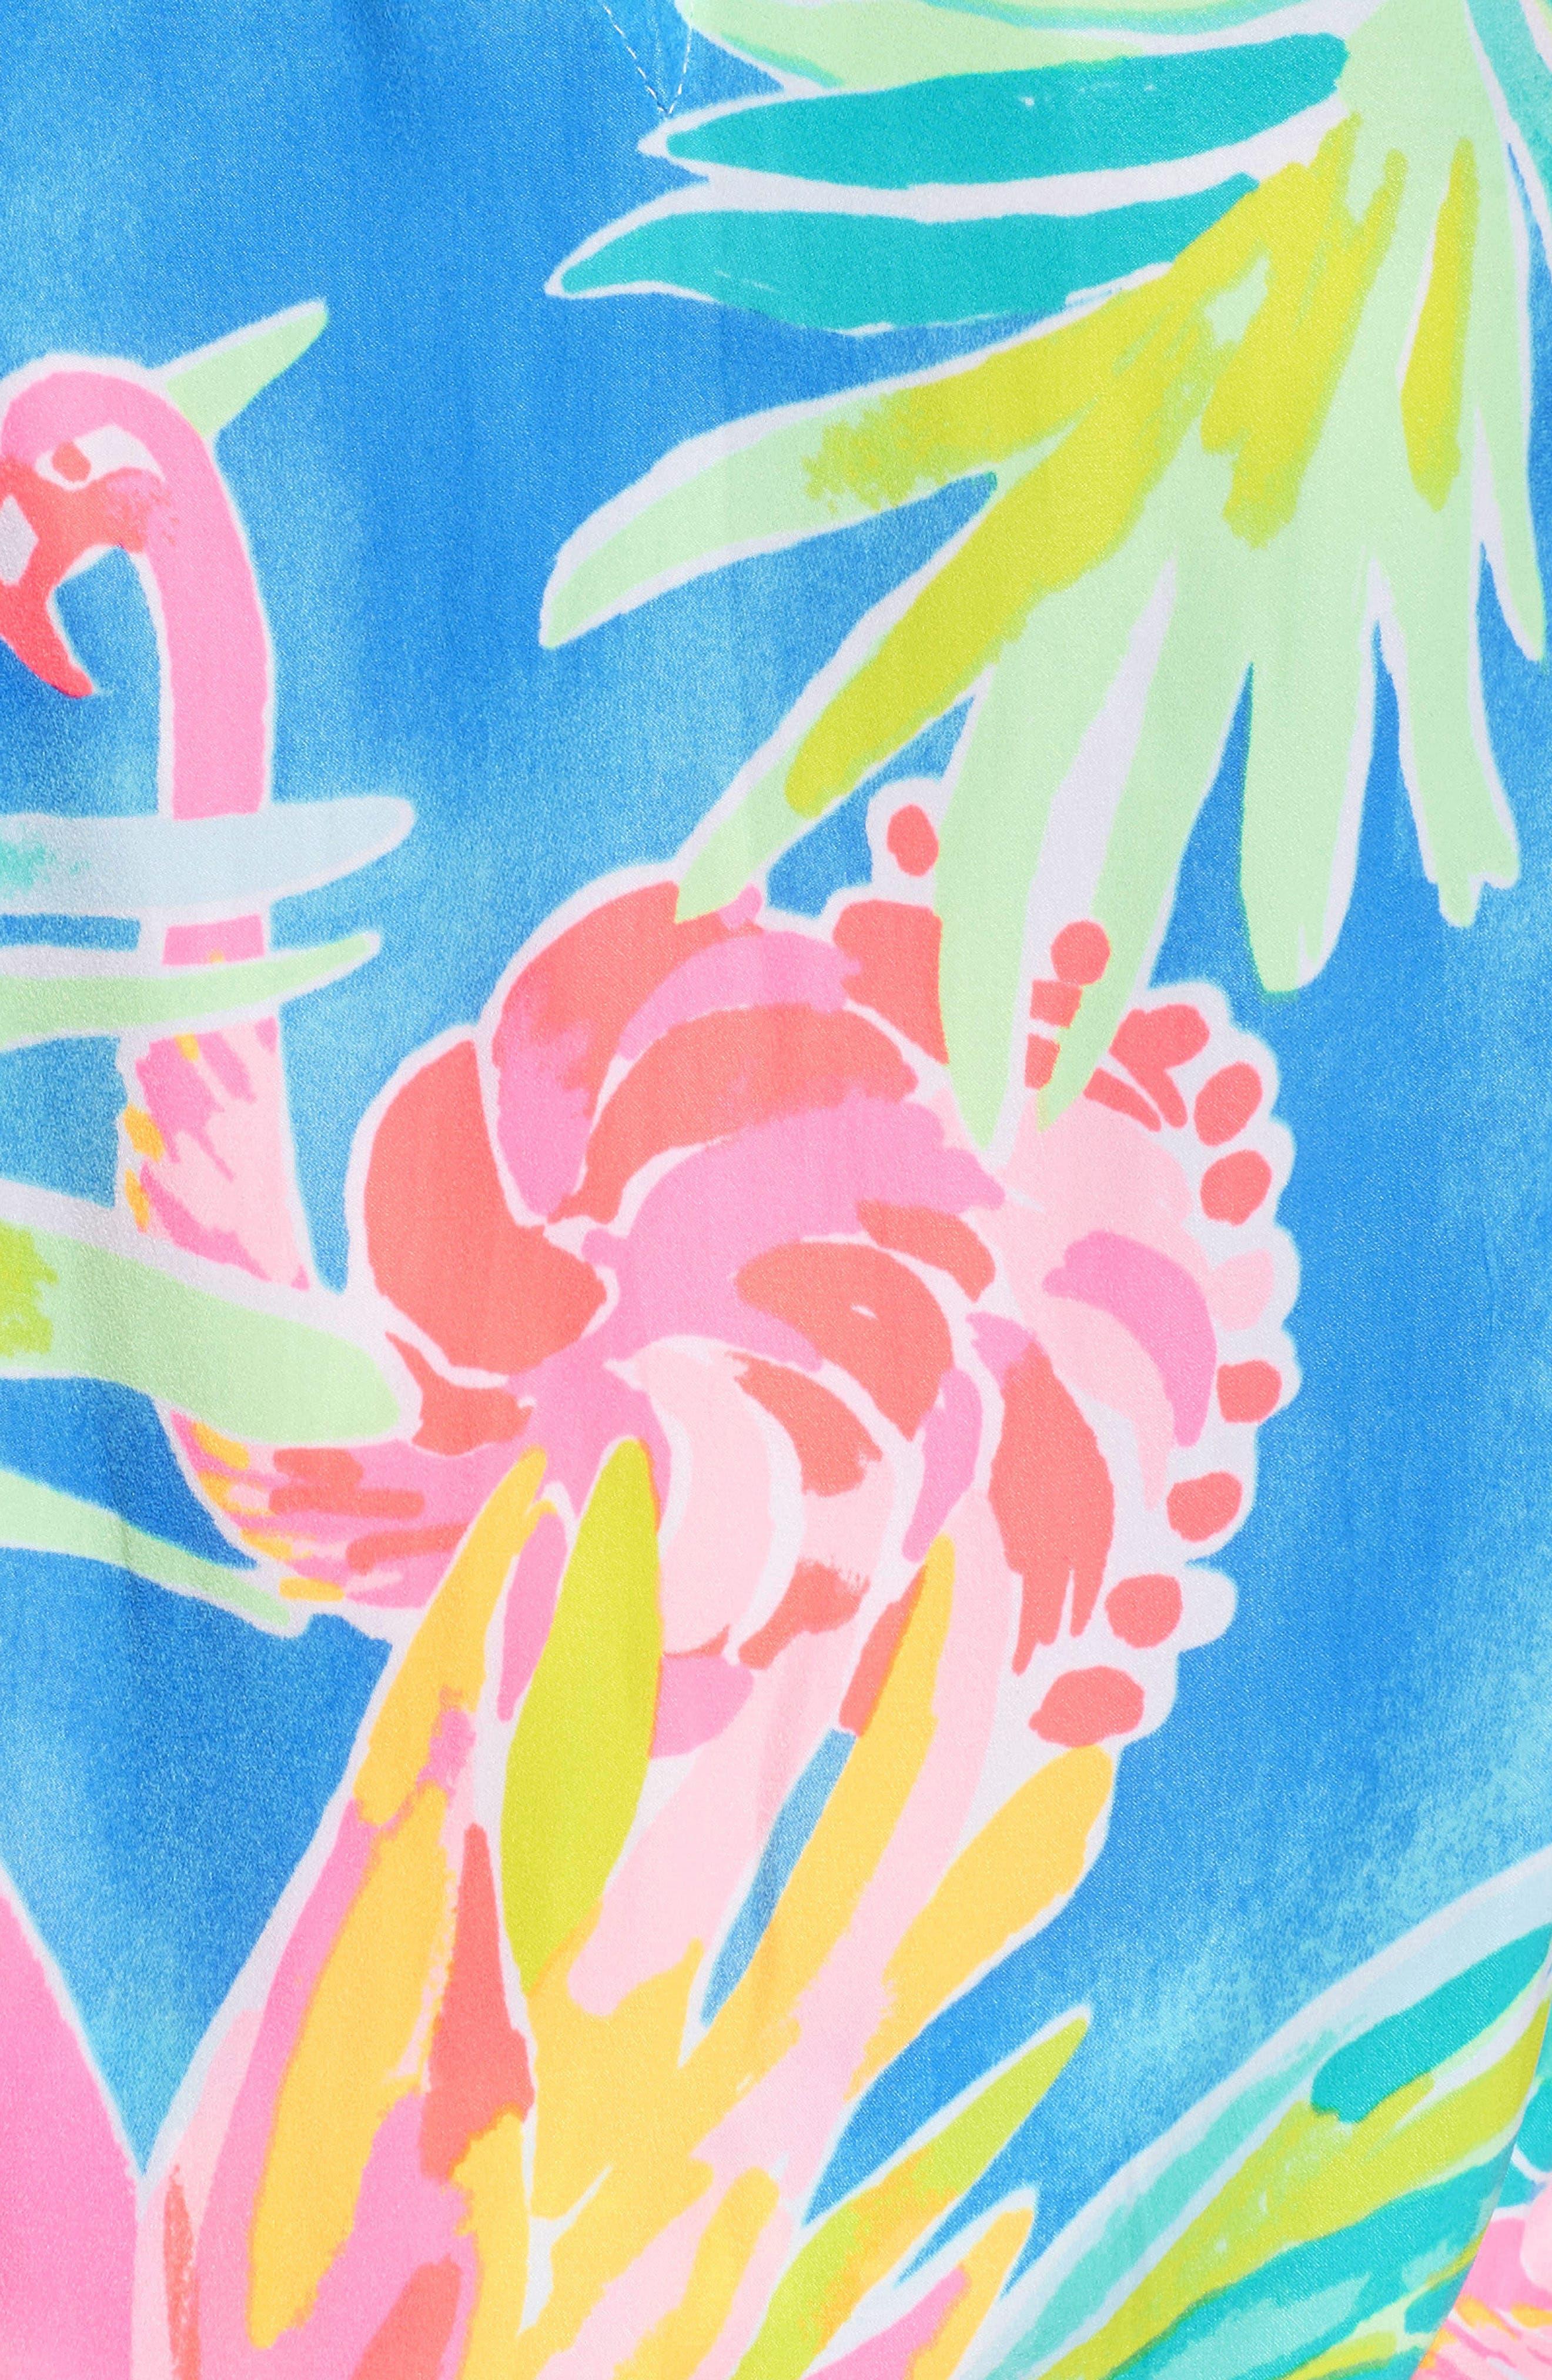 Kellen Top & Shorts Set,                             Alternate thumbnail 6, color,                             420